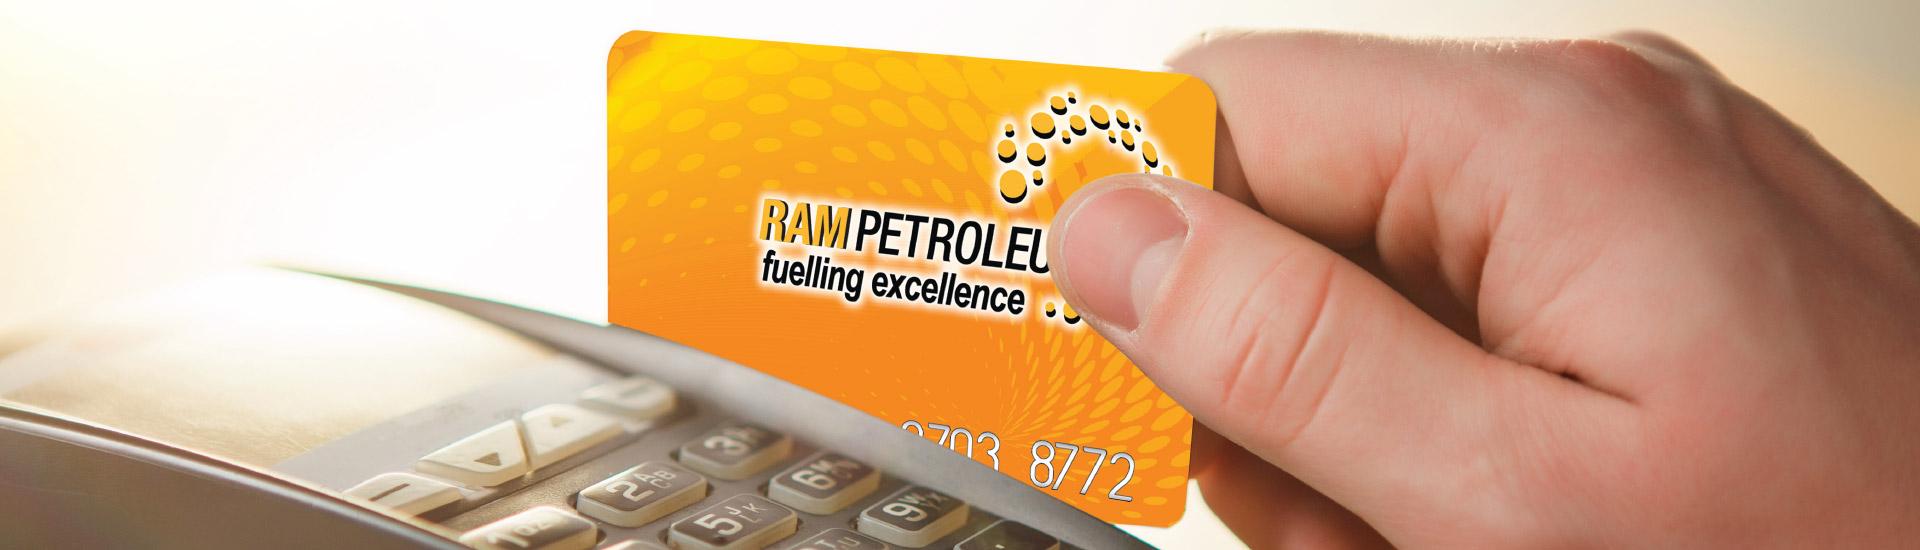 Ram Fuel Card